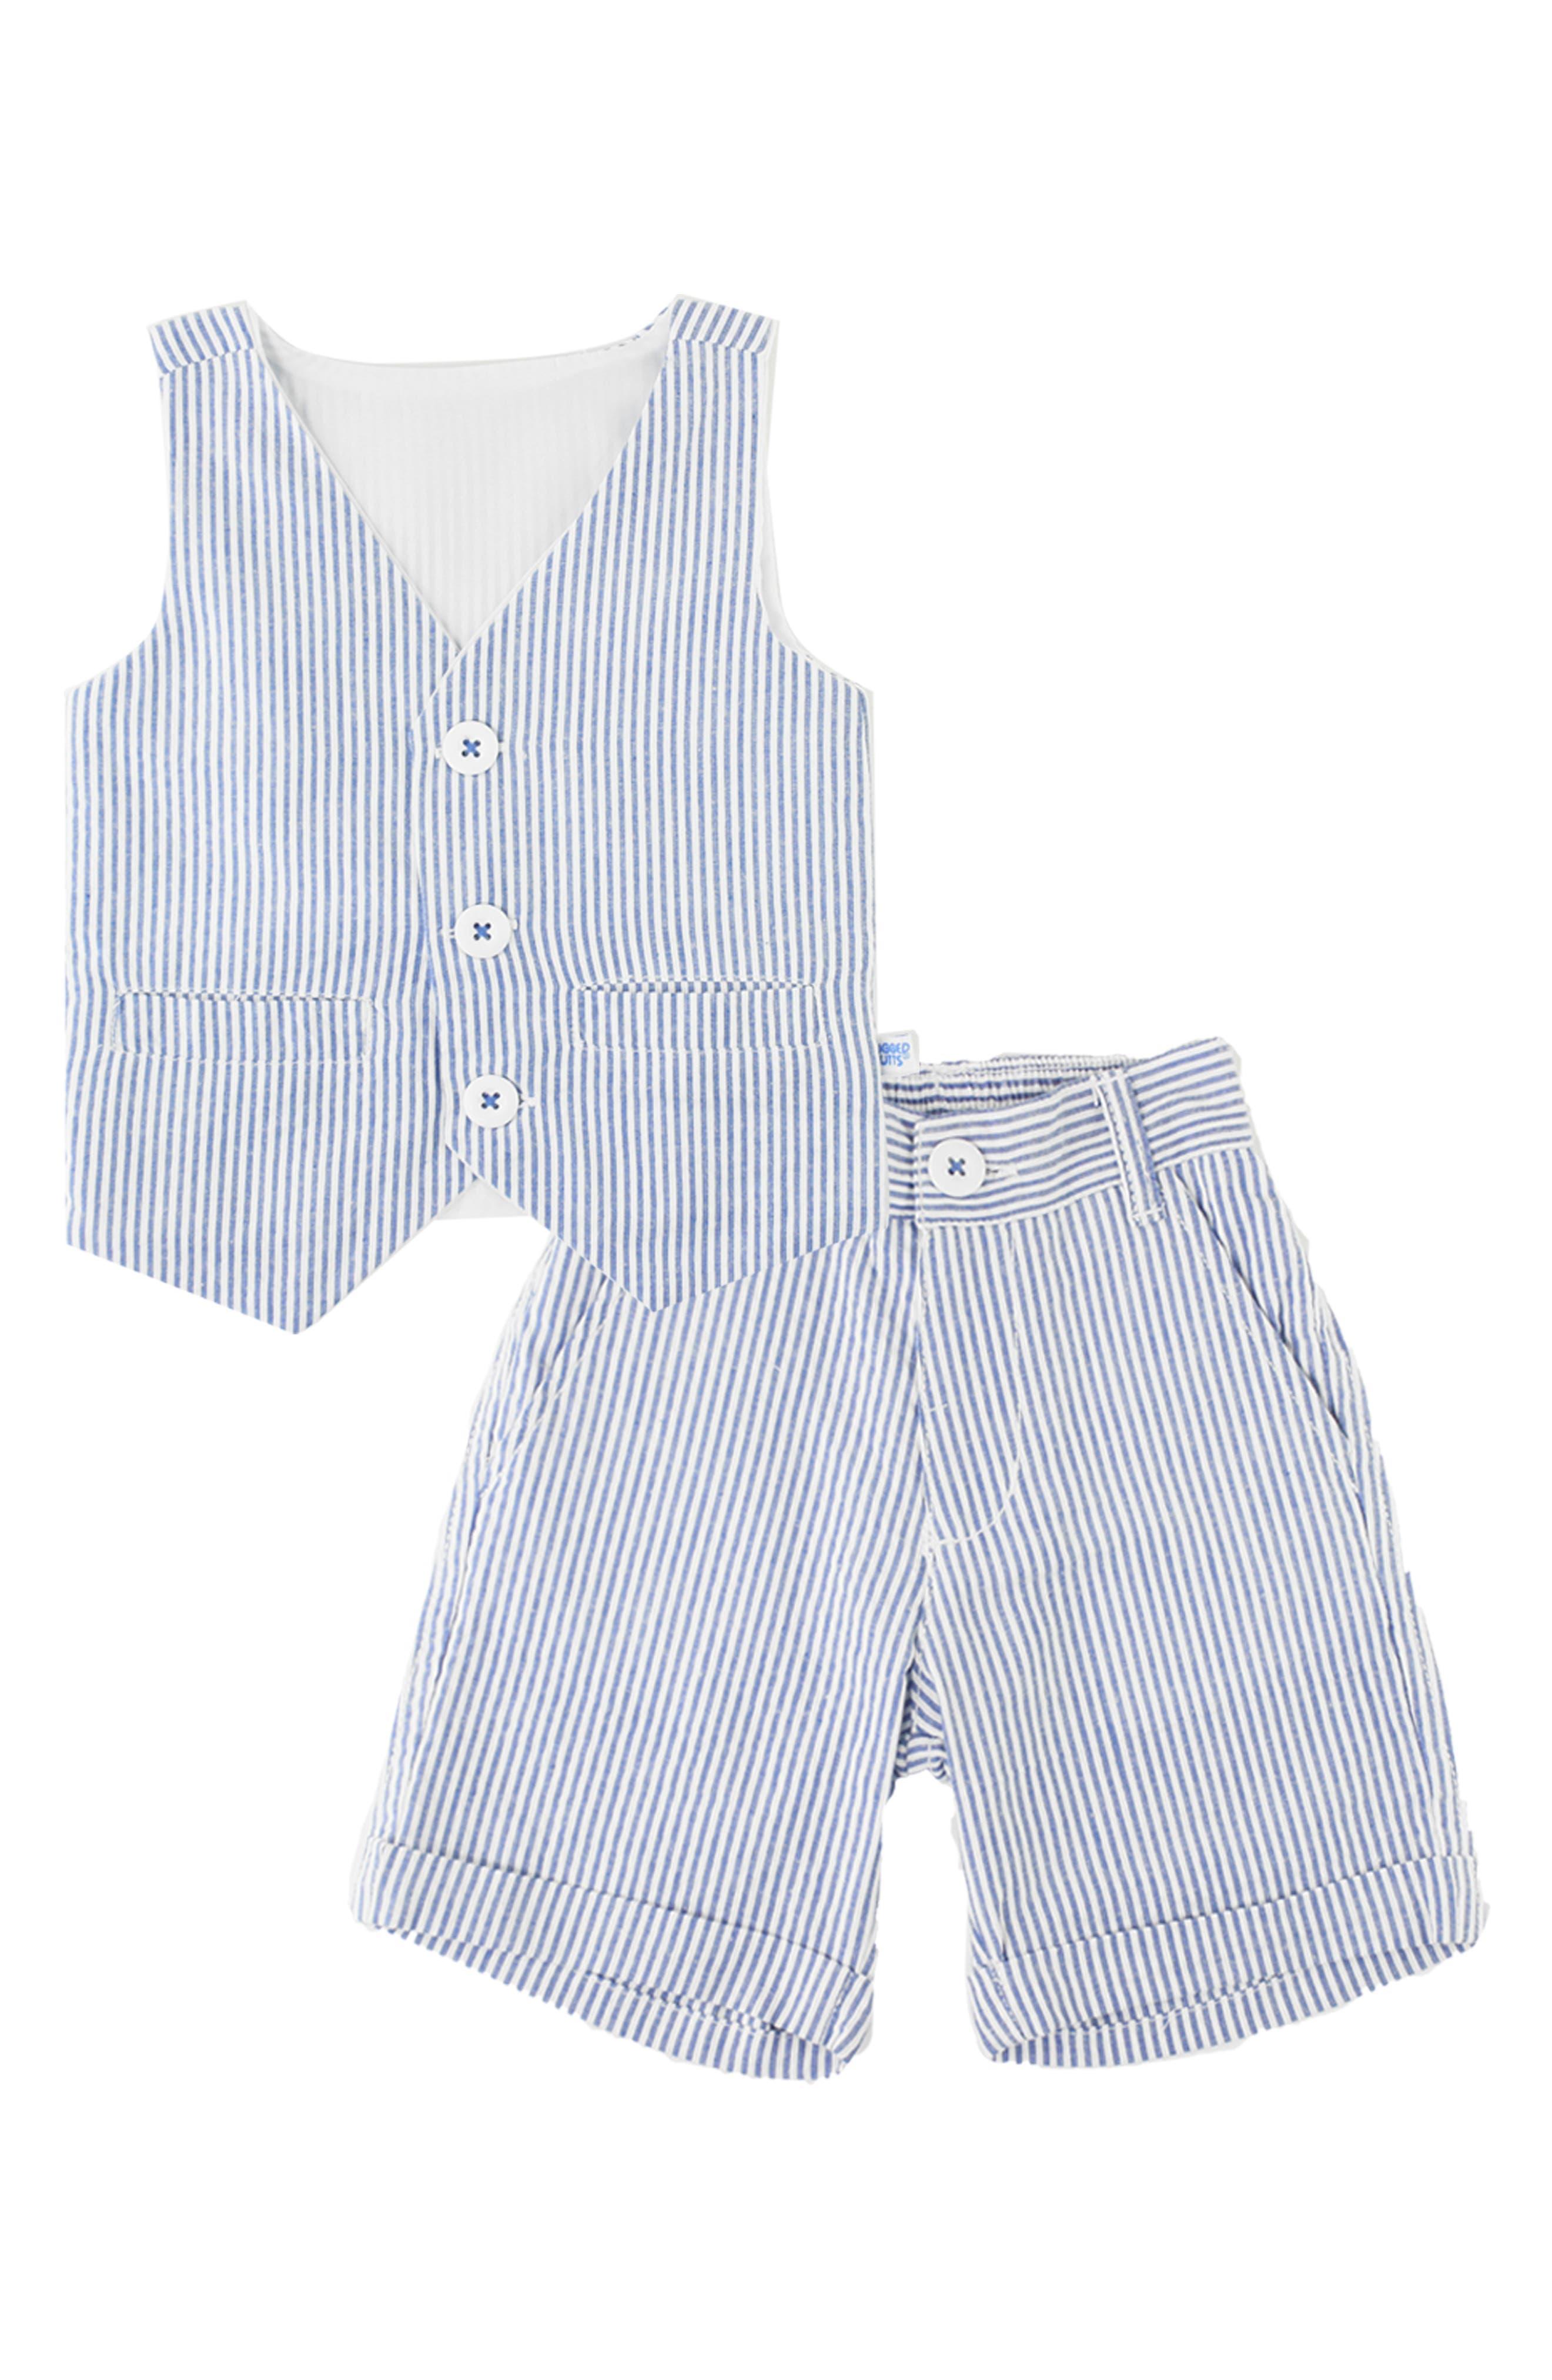 RUGGEDBUTTS, Seersucker Vest & Shorts Set, Main thumbnail 1, color, BLUE